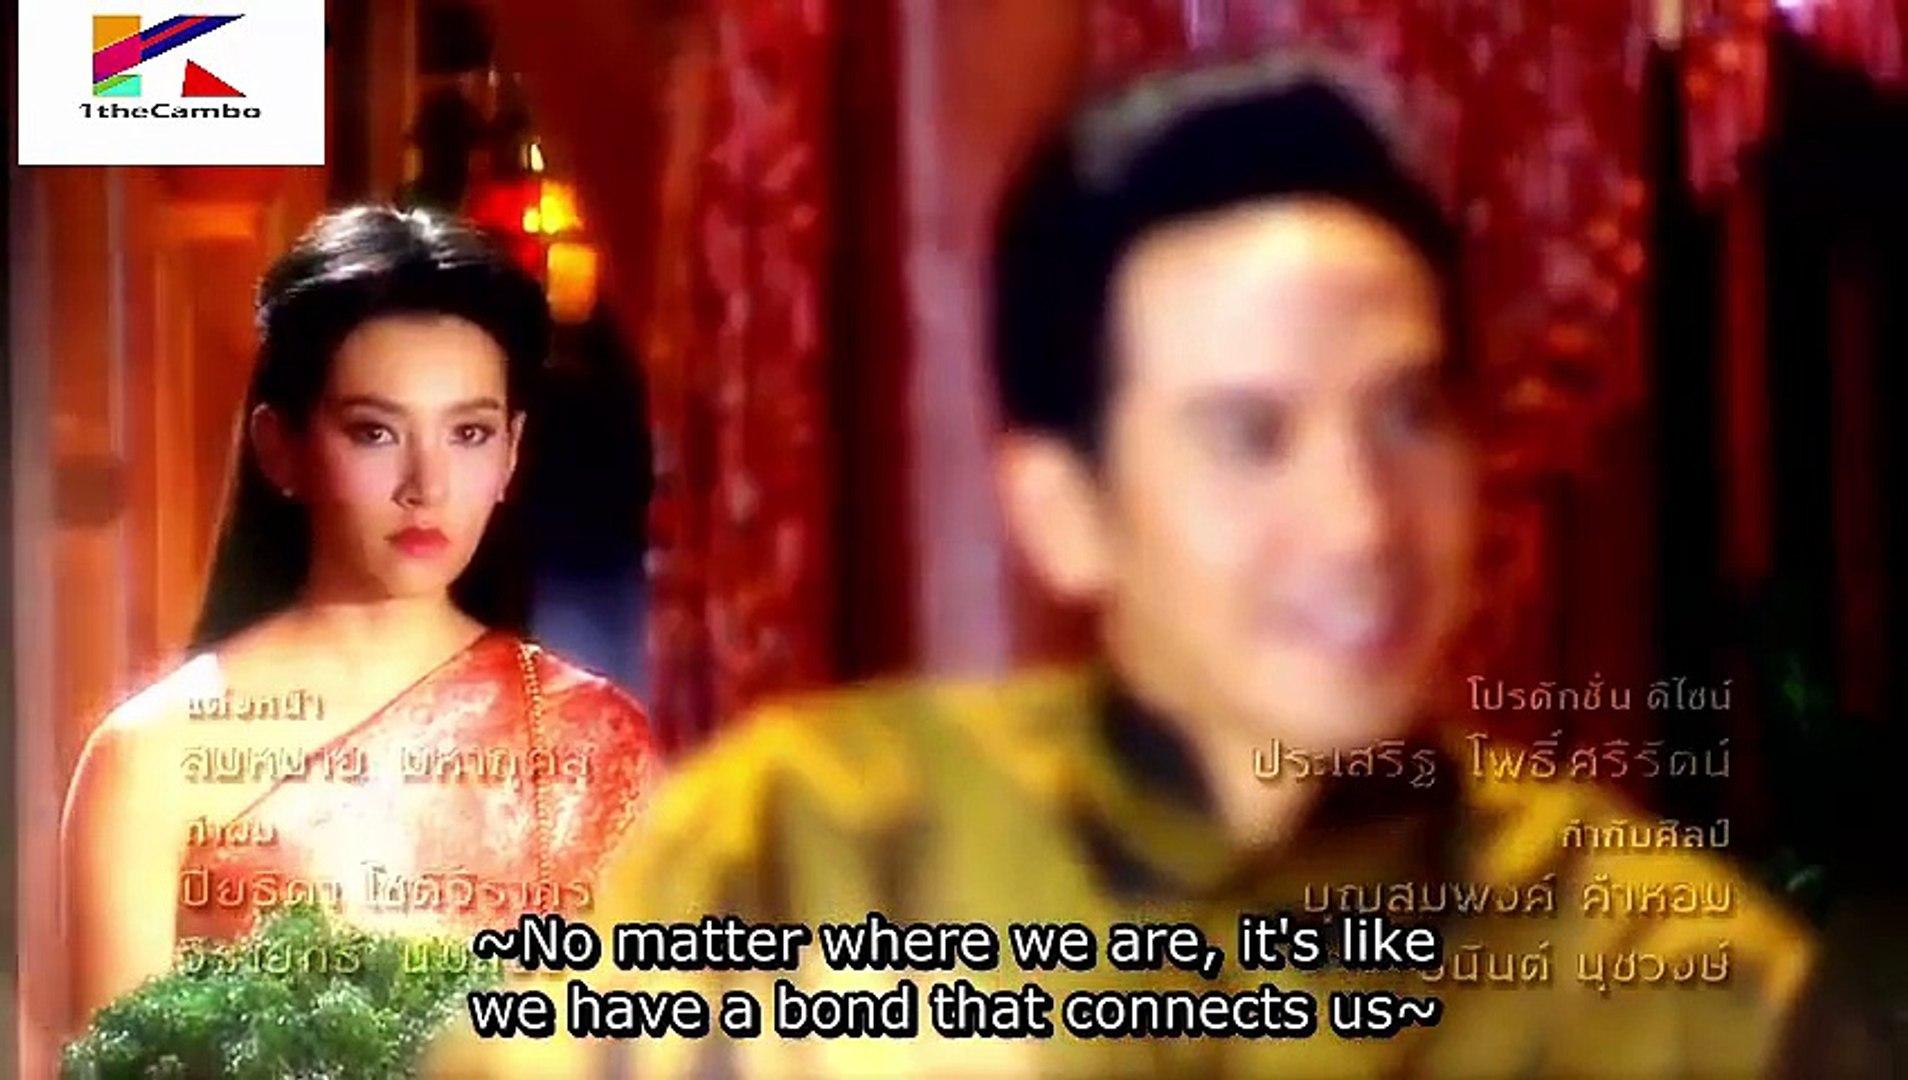 [ENG SUB] Bhuppae Sunniwat Ep 1 Eng Sub | บุพเพสันนิวาส | New Thai Drama  2018 with English Subtitles